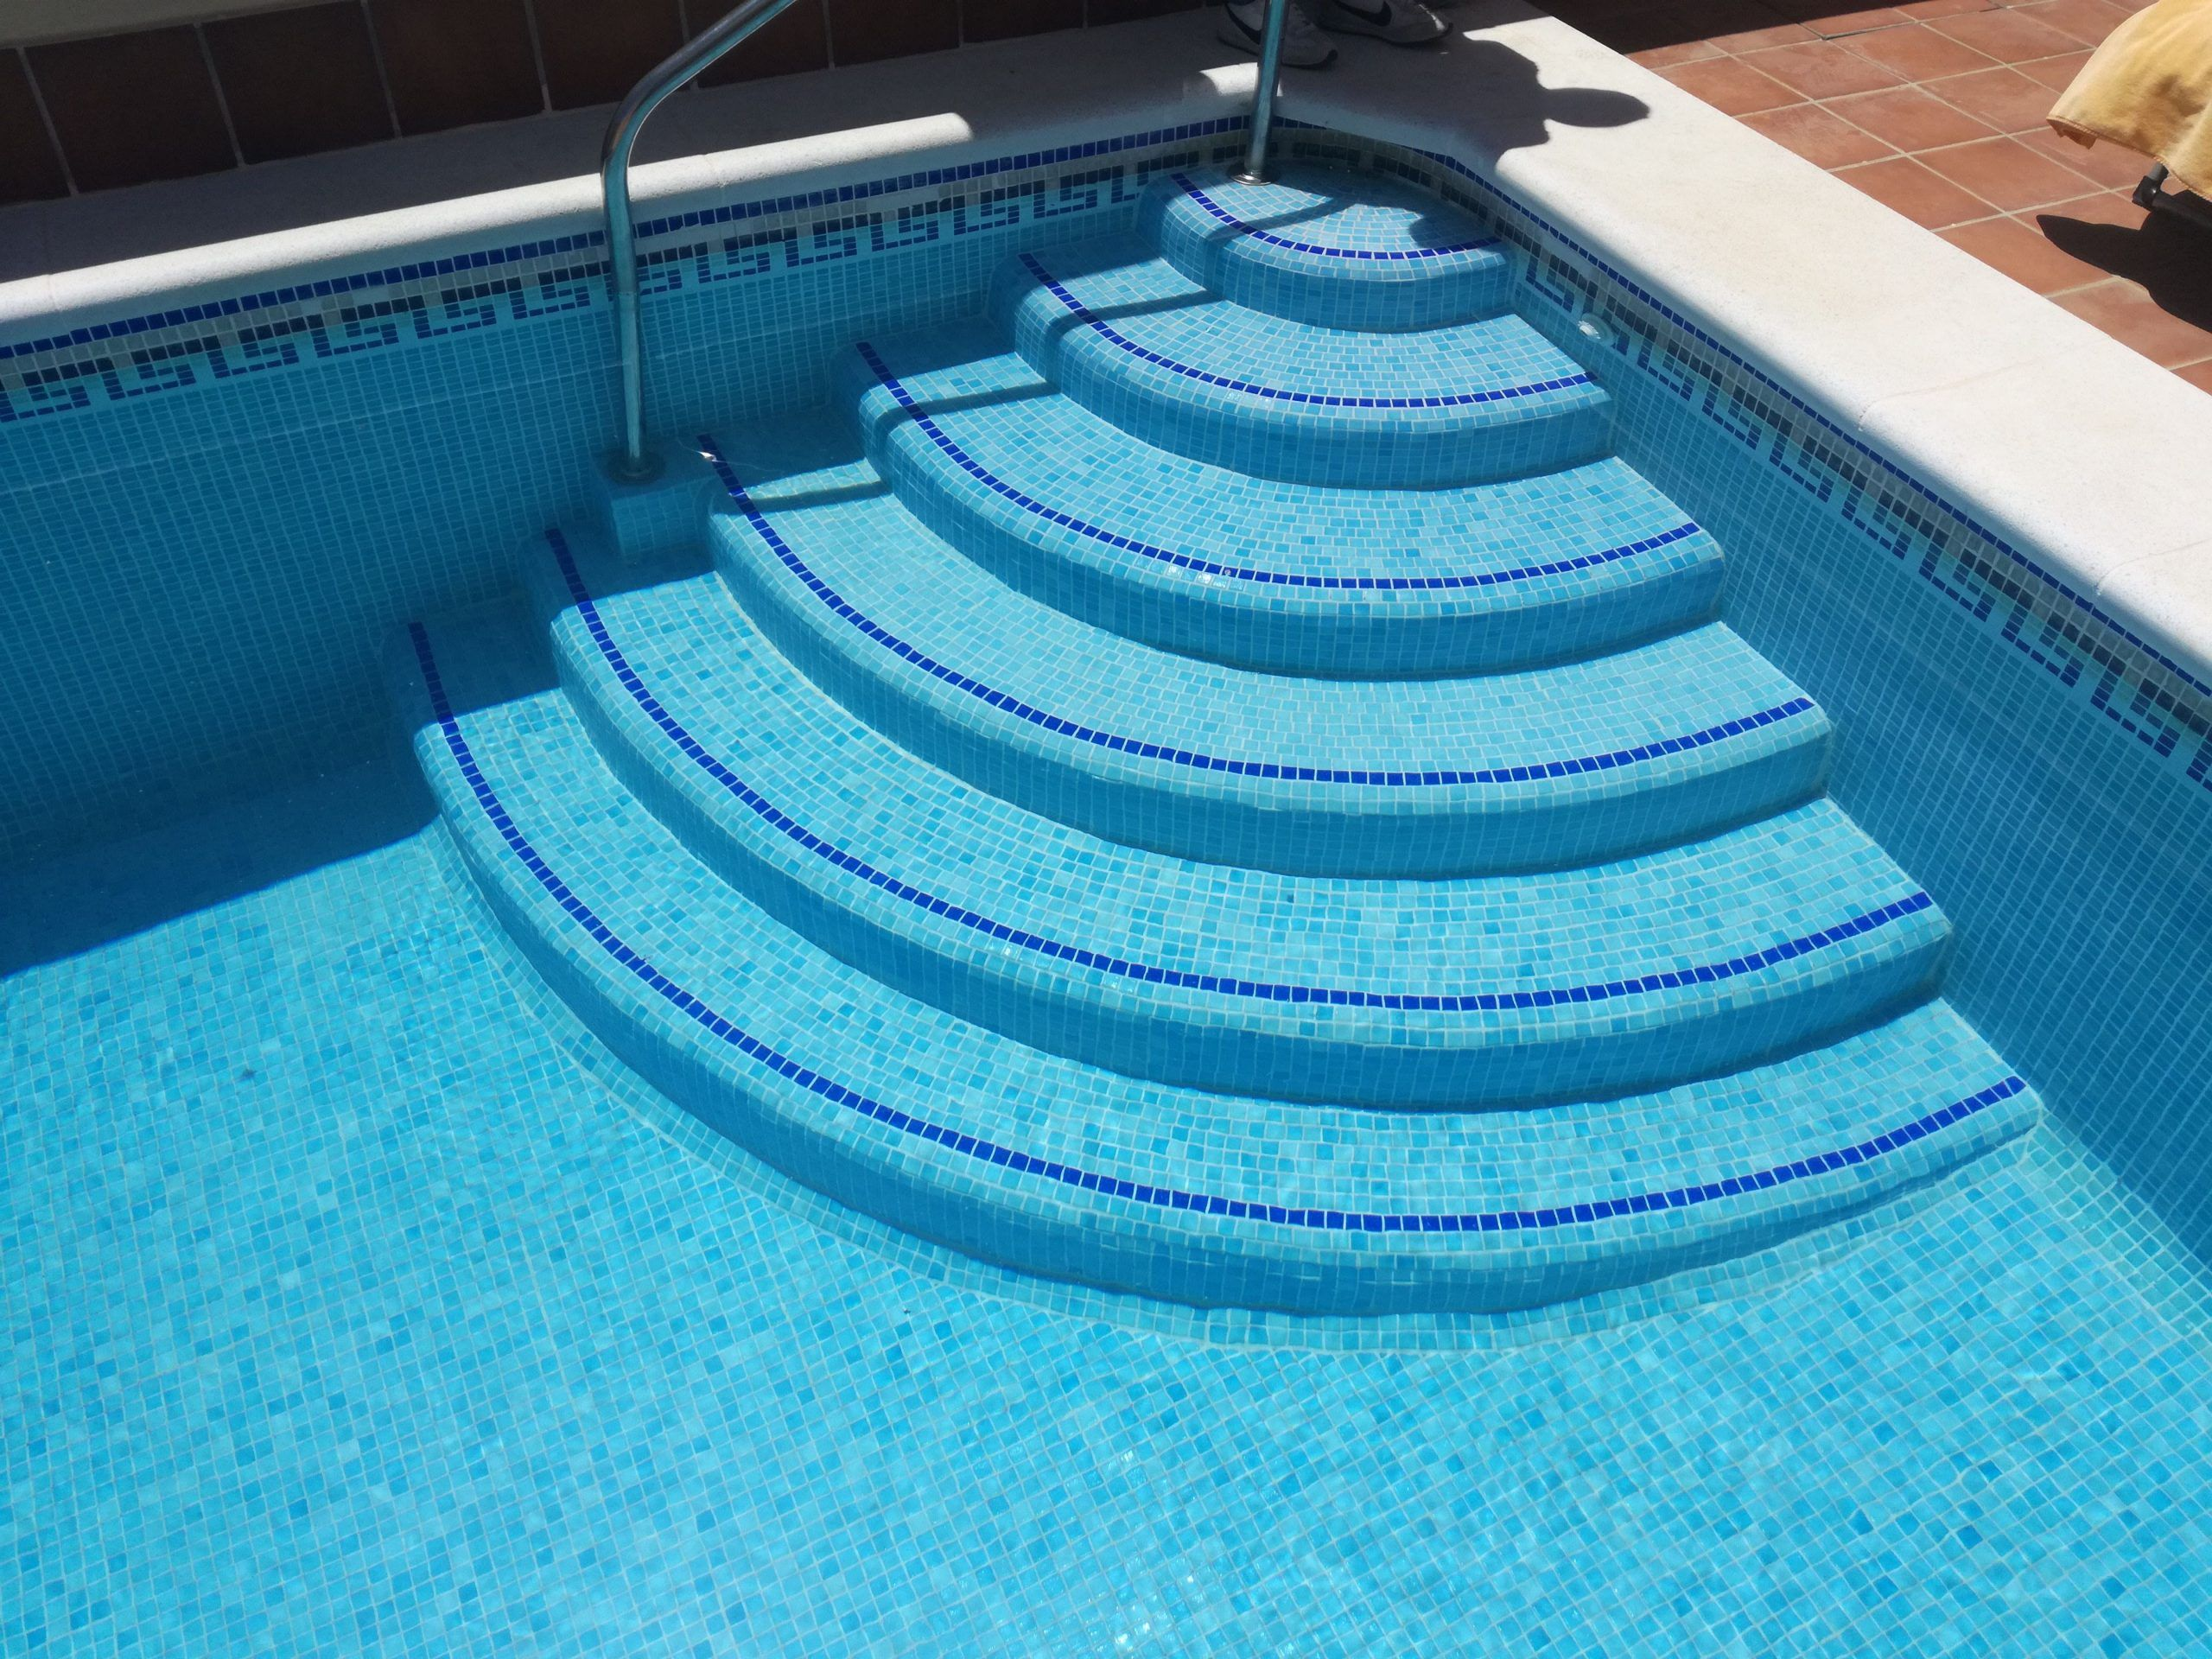 Escalera en piscina de obra redonda 1/4 de circulo